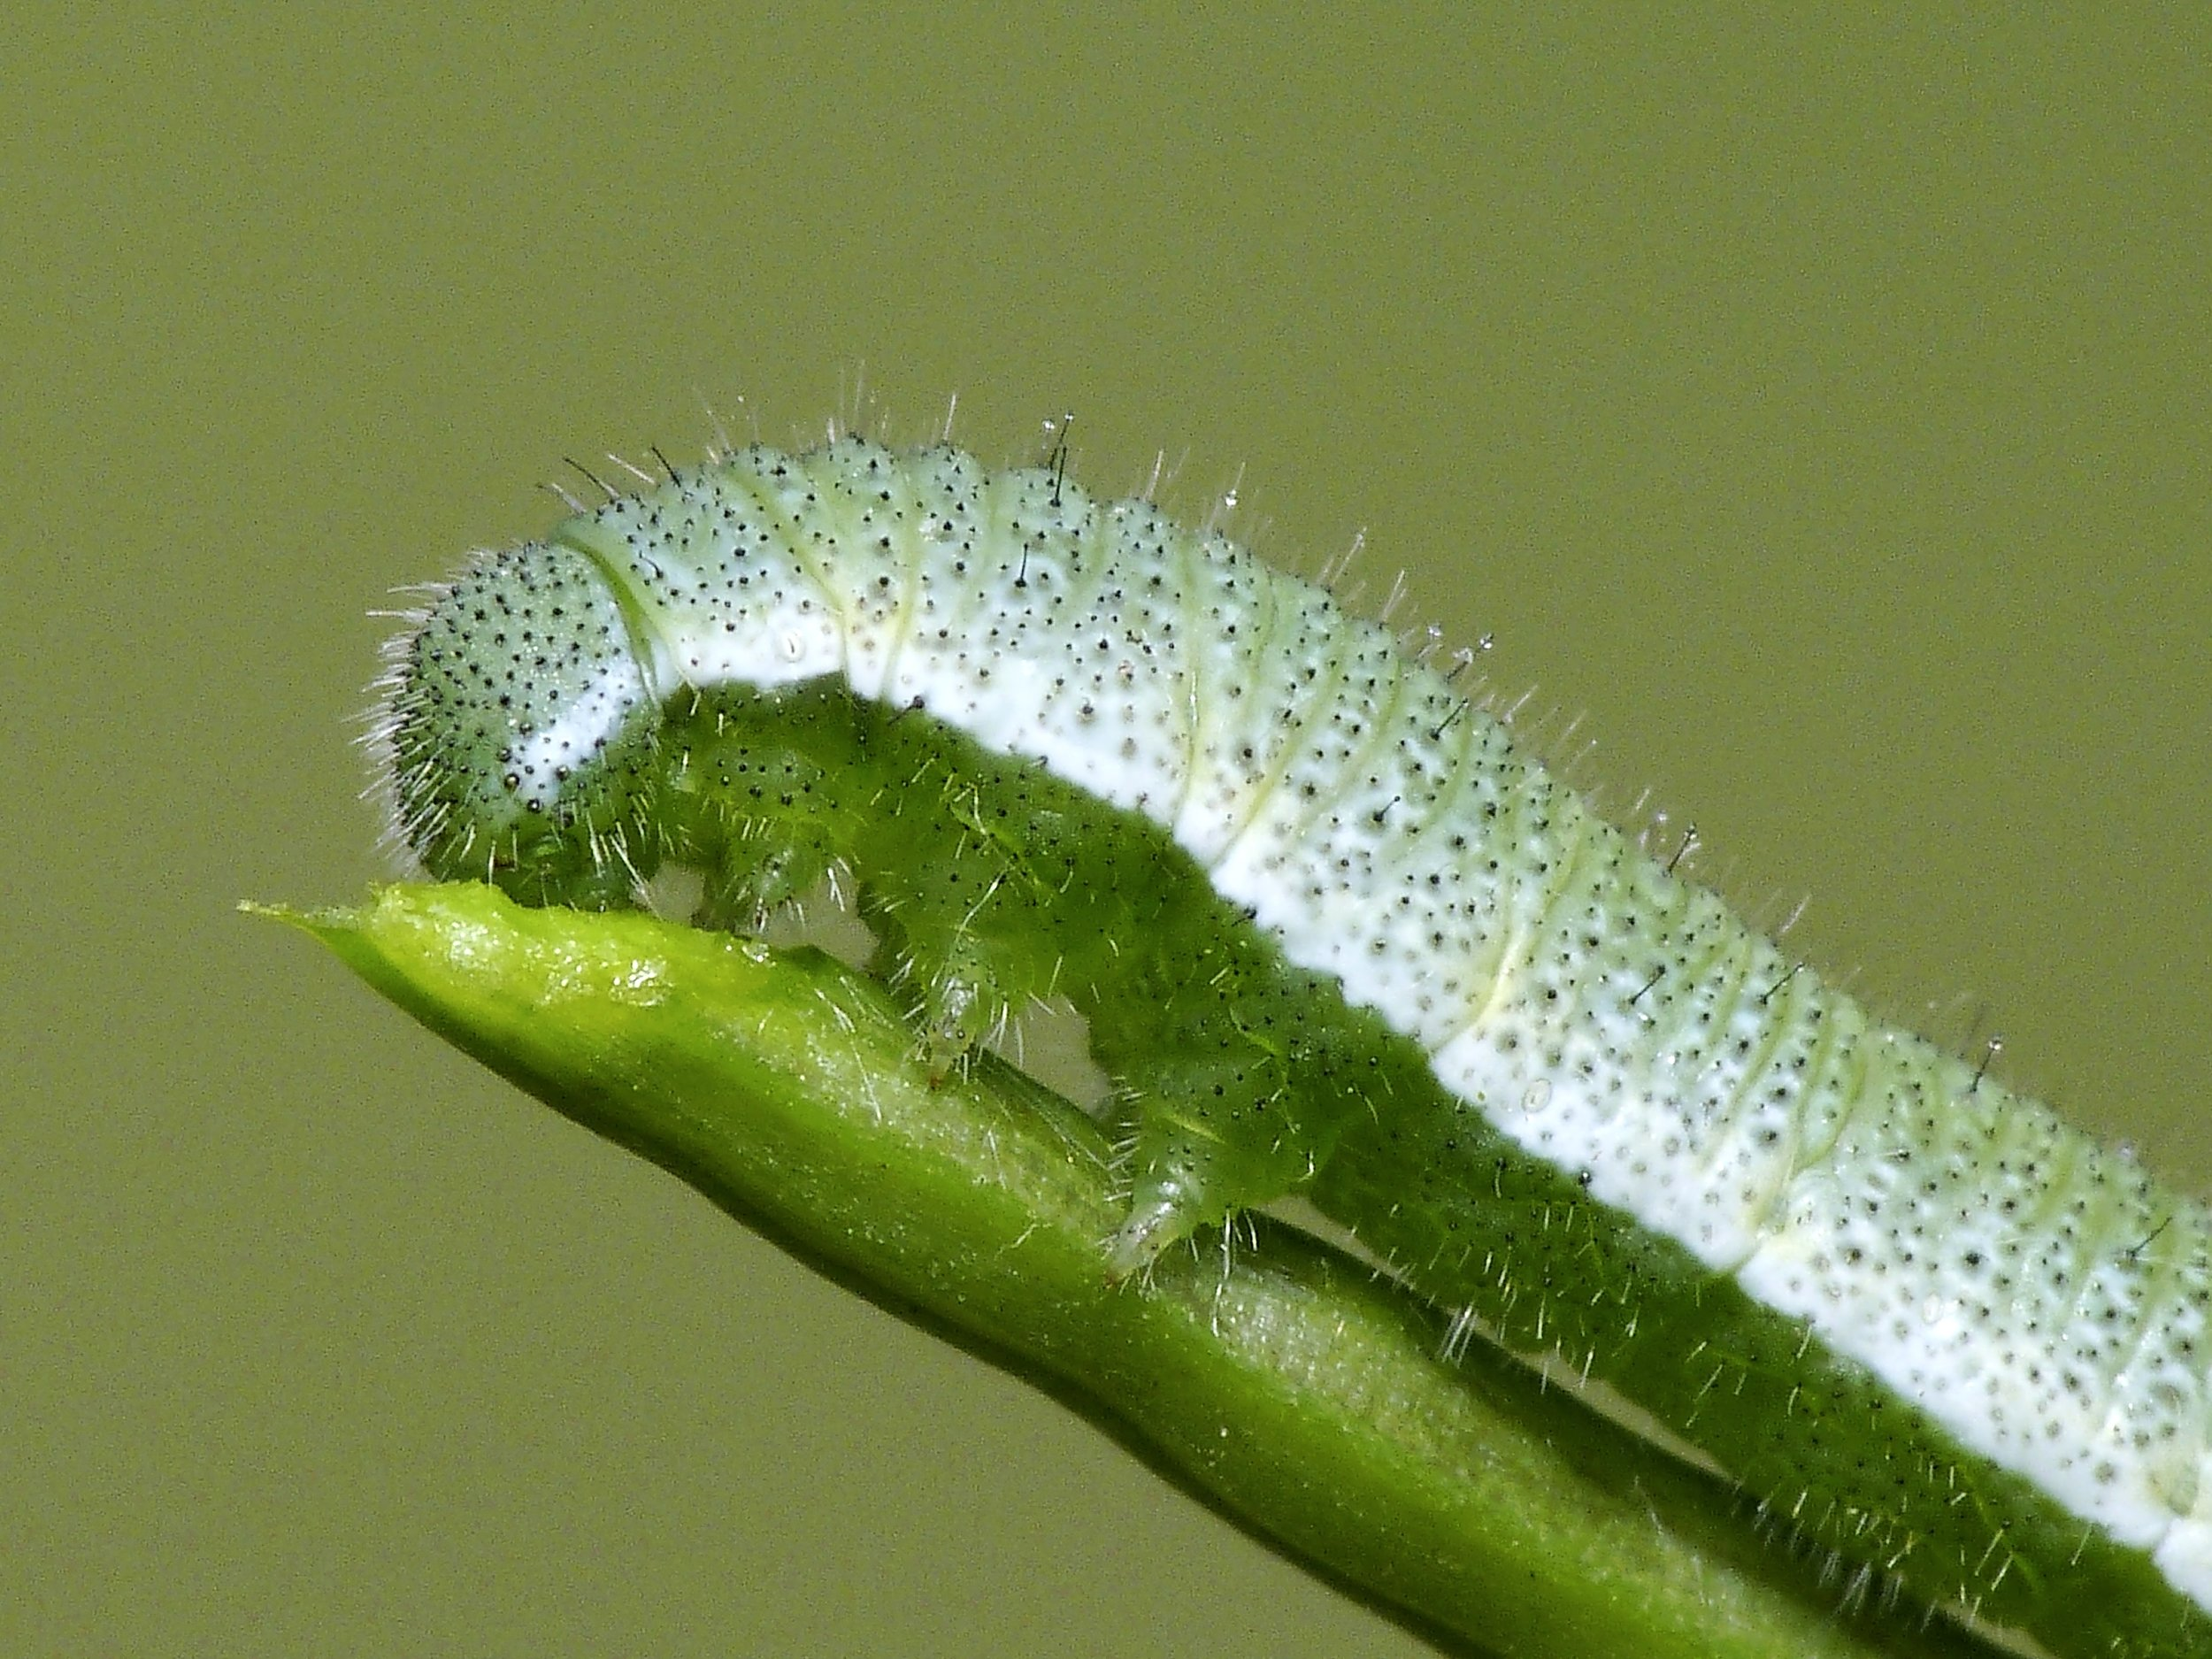 Leave caterpillars